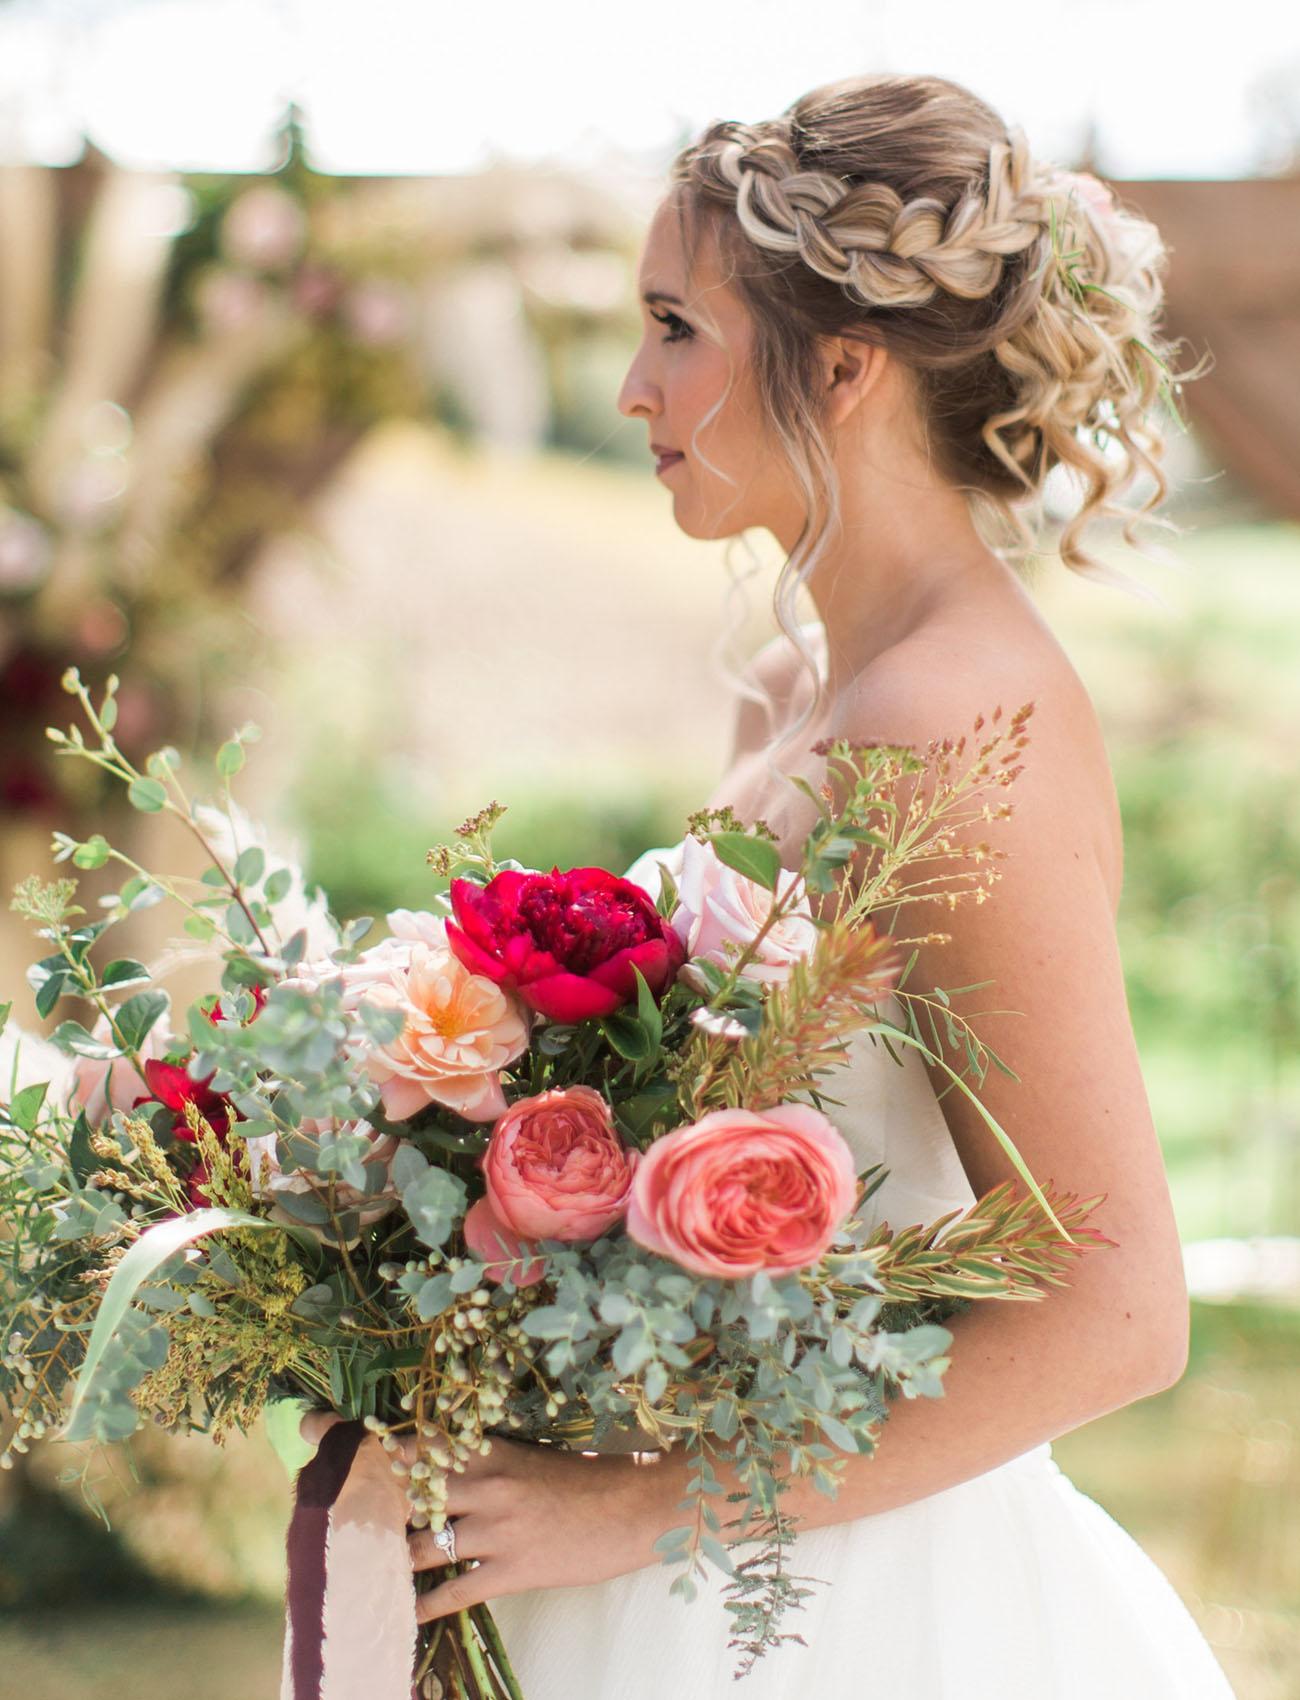 braided bride